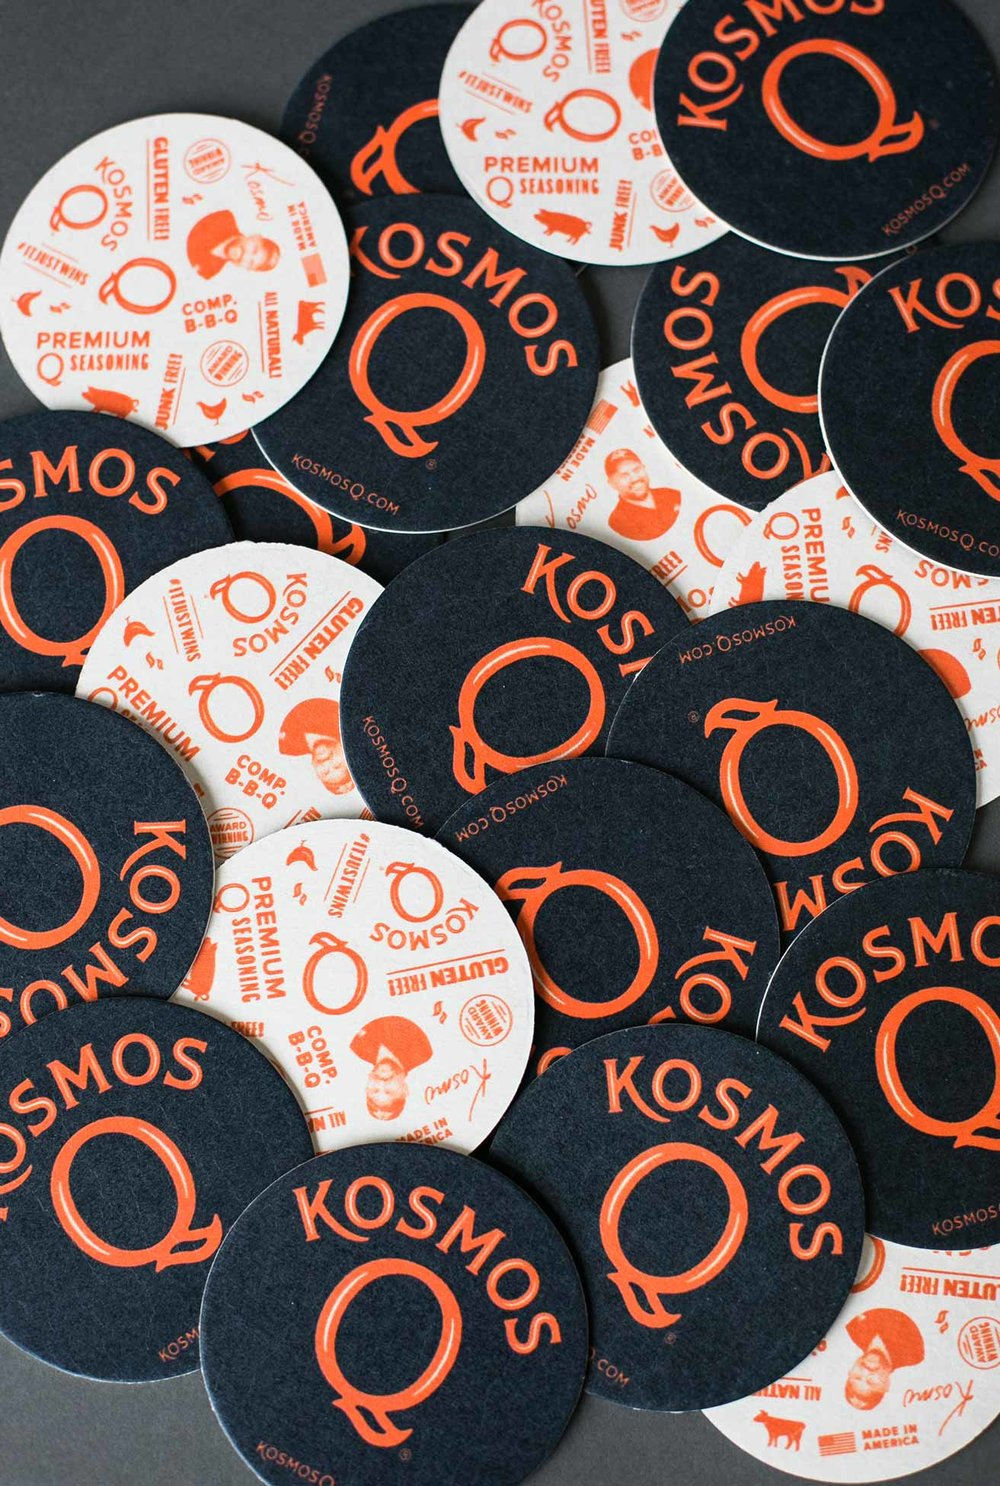 kosmosq-vert_coasters.jpg